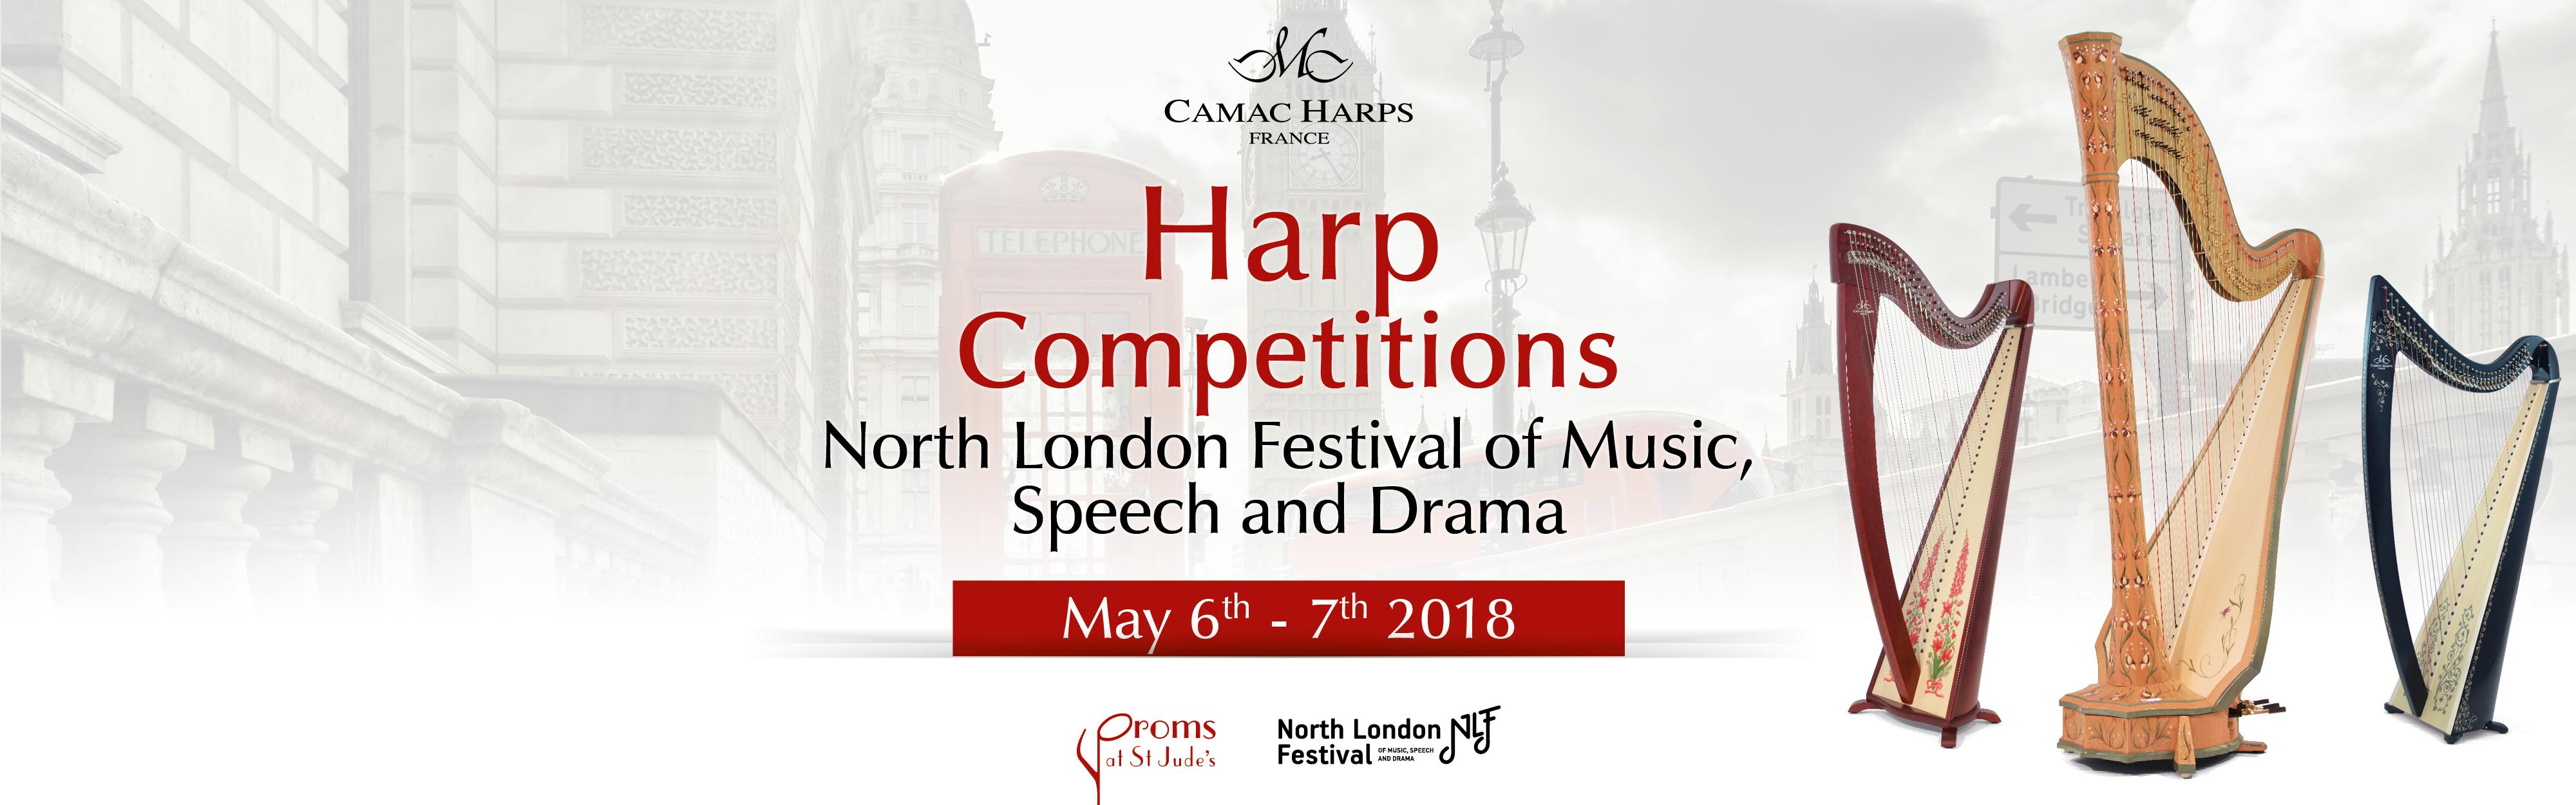 Camac Harp Competition, Londres 2018 - Camac Harps : Camac ...